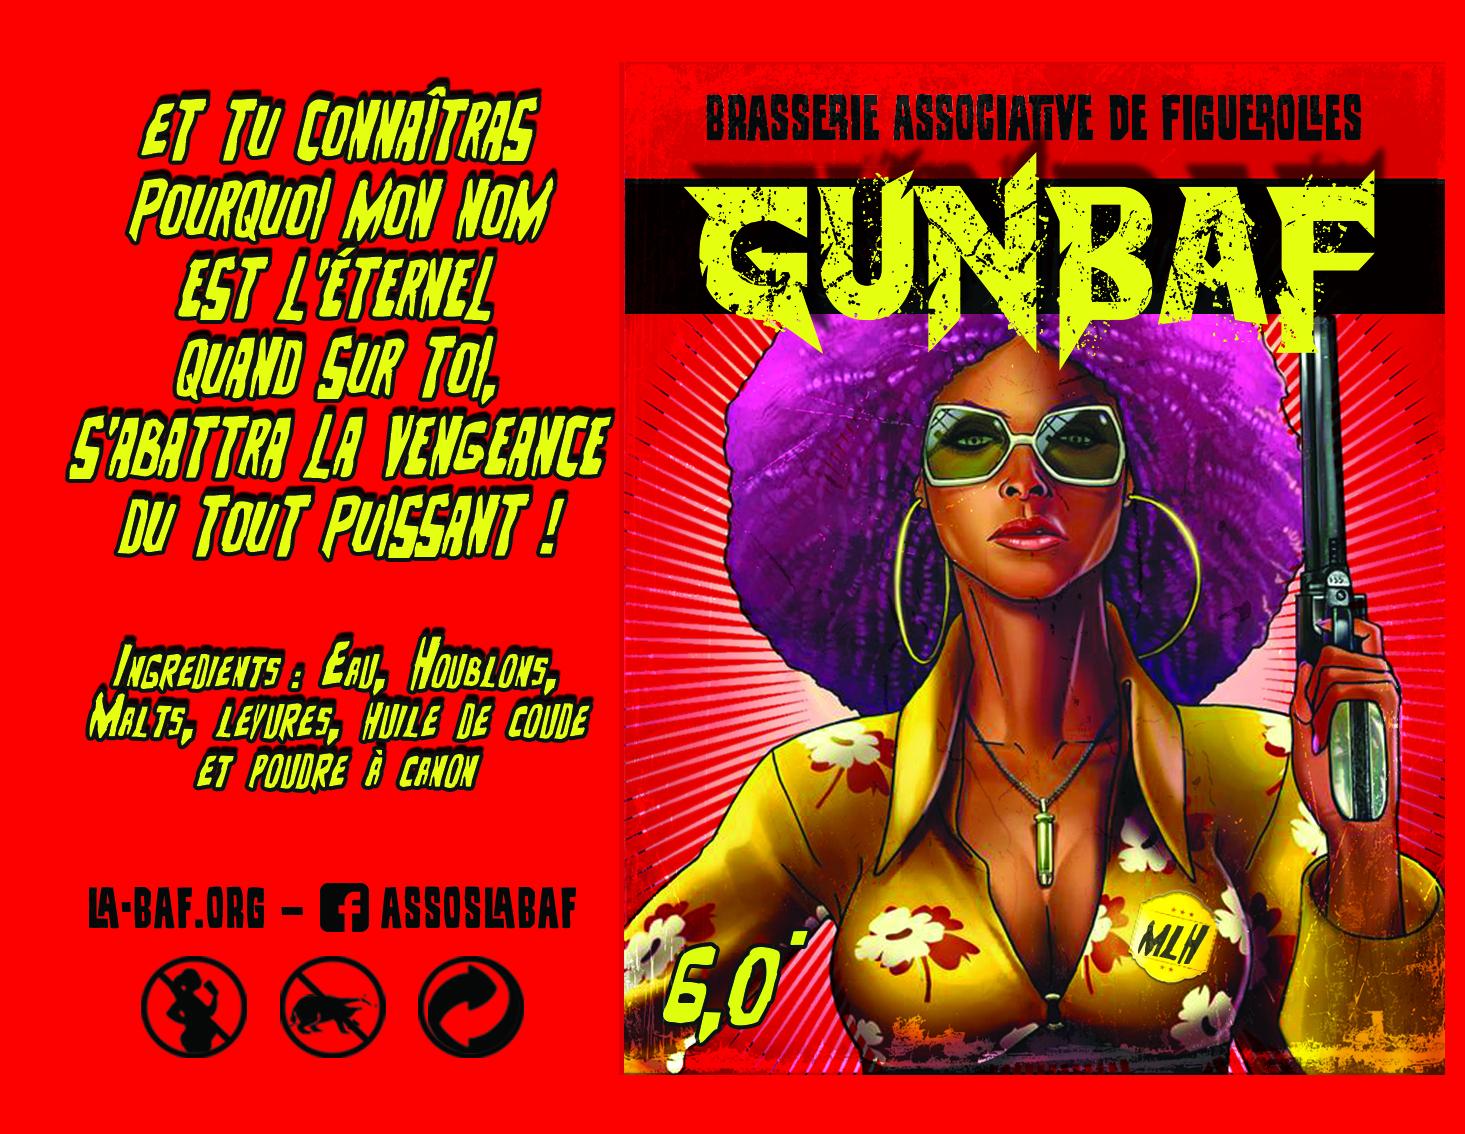 Gunbaf